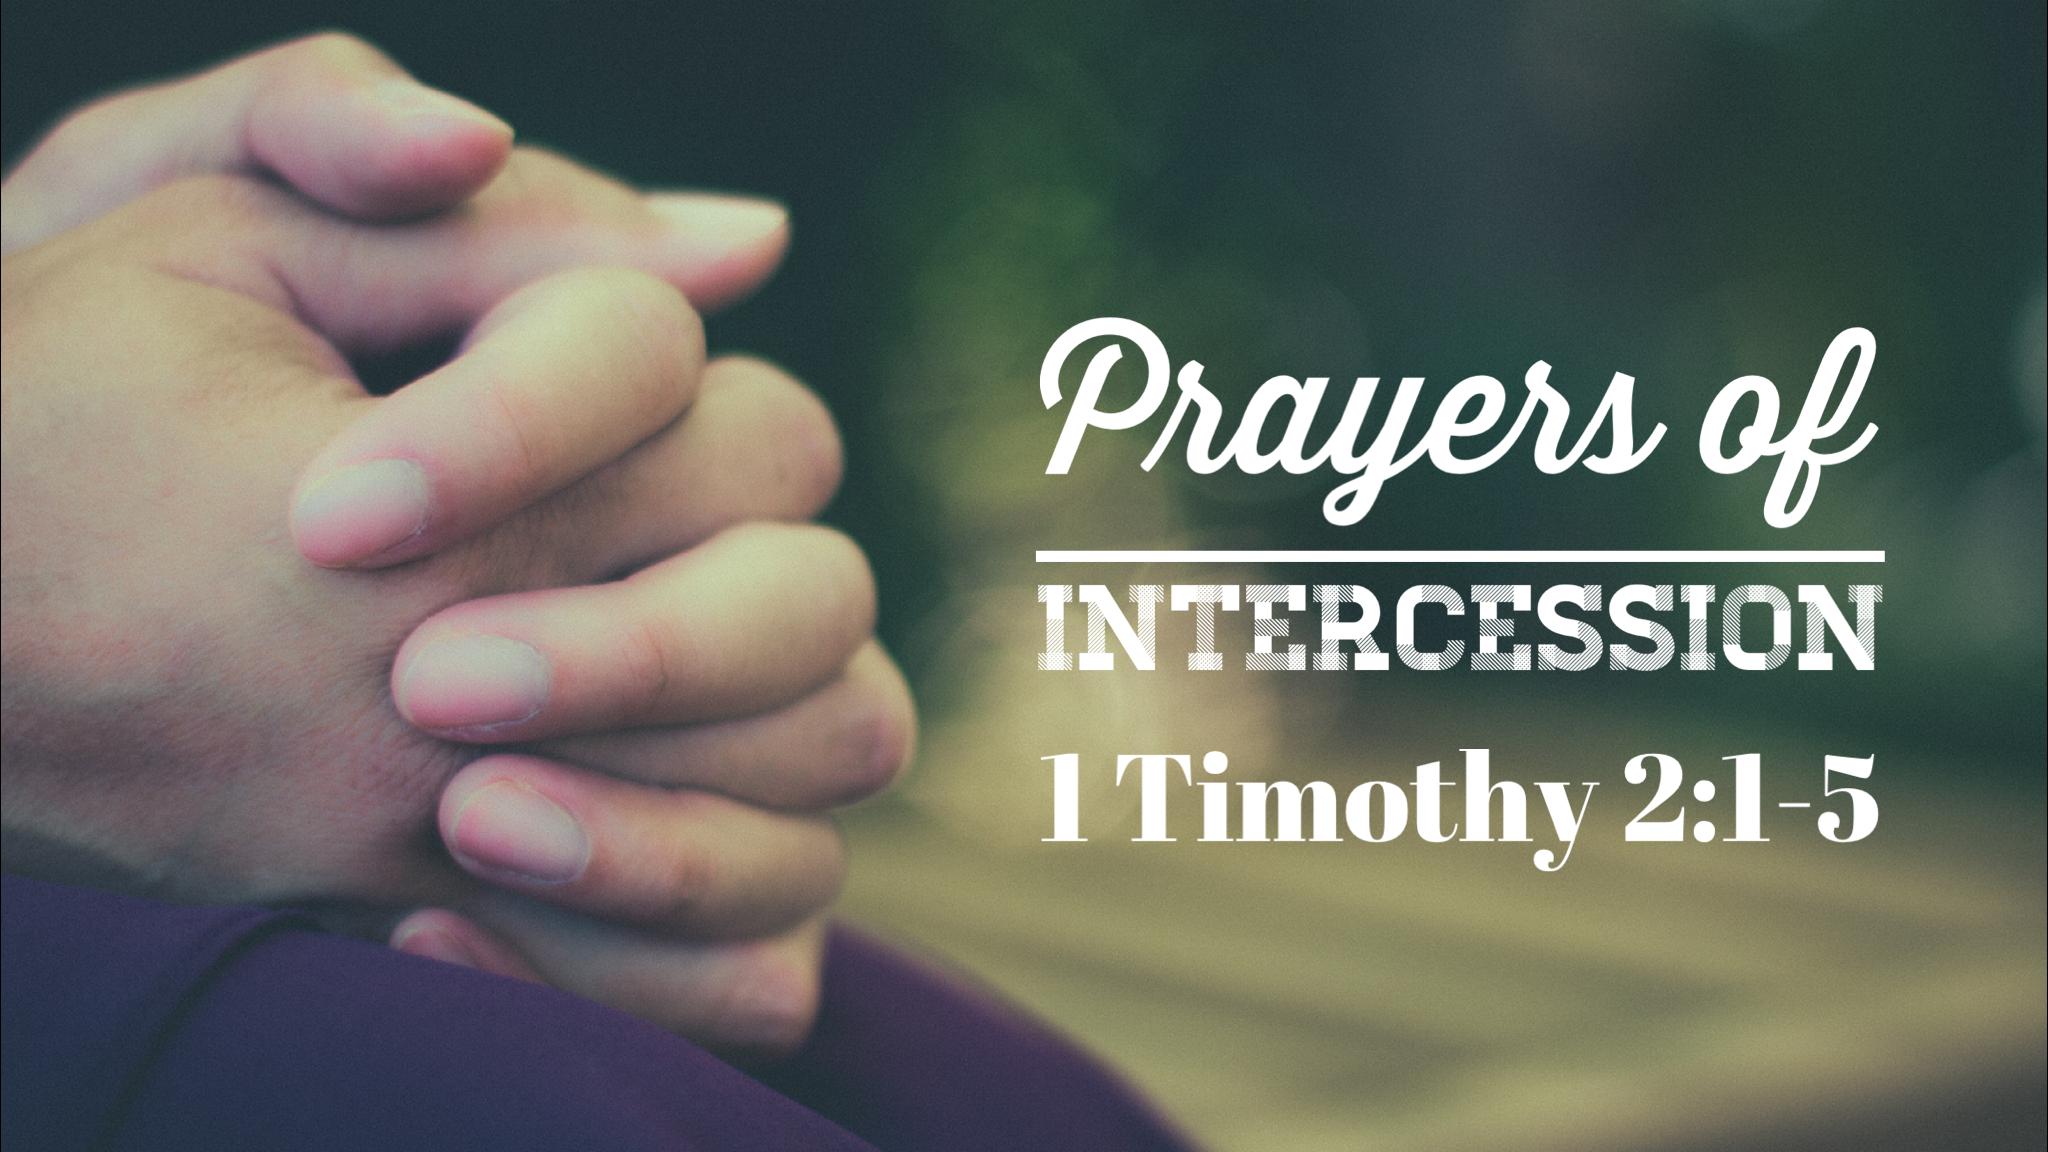 Prayers of Intercession (1 Timothy 2:1-5) - June 10, 2018